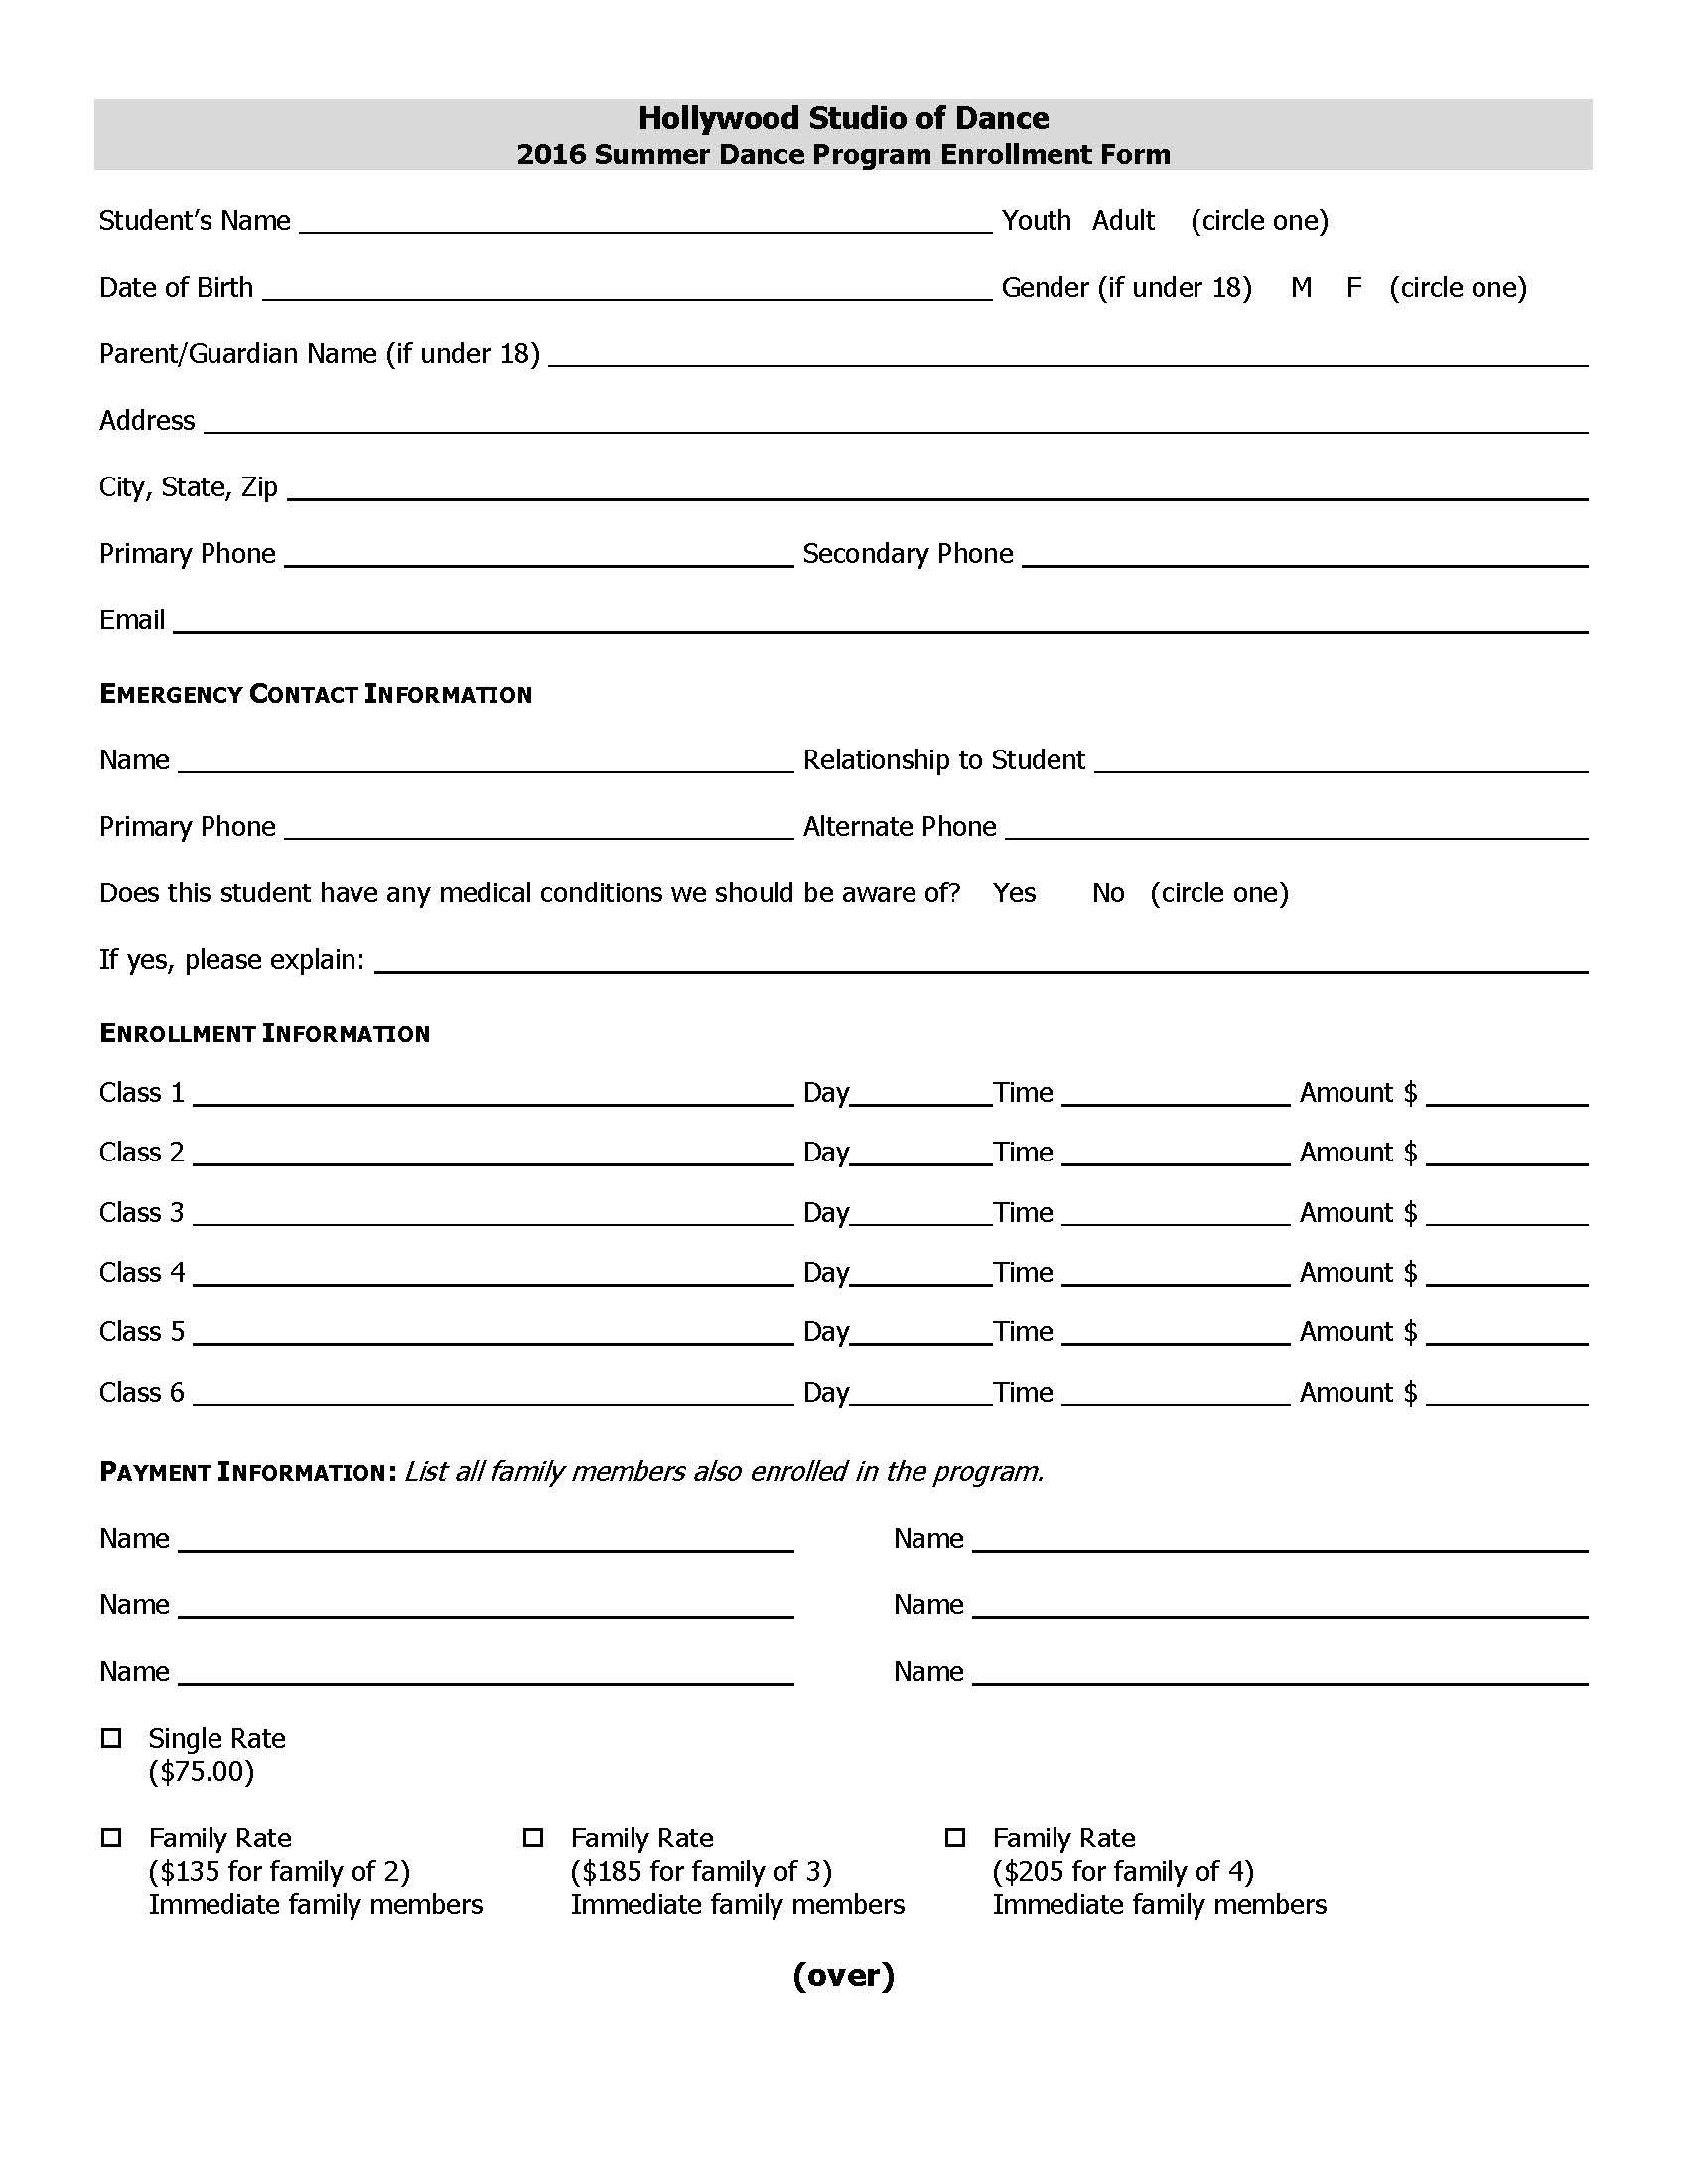 Summer Enrollment Form | Business website